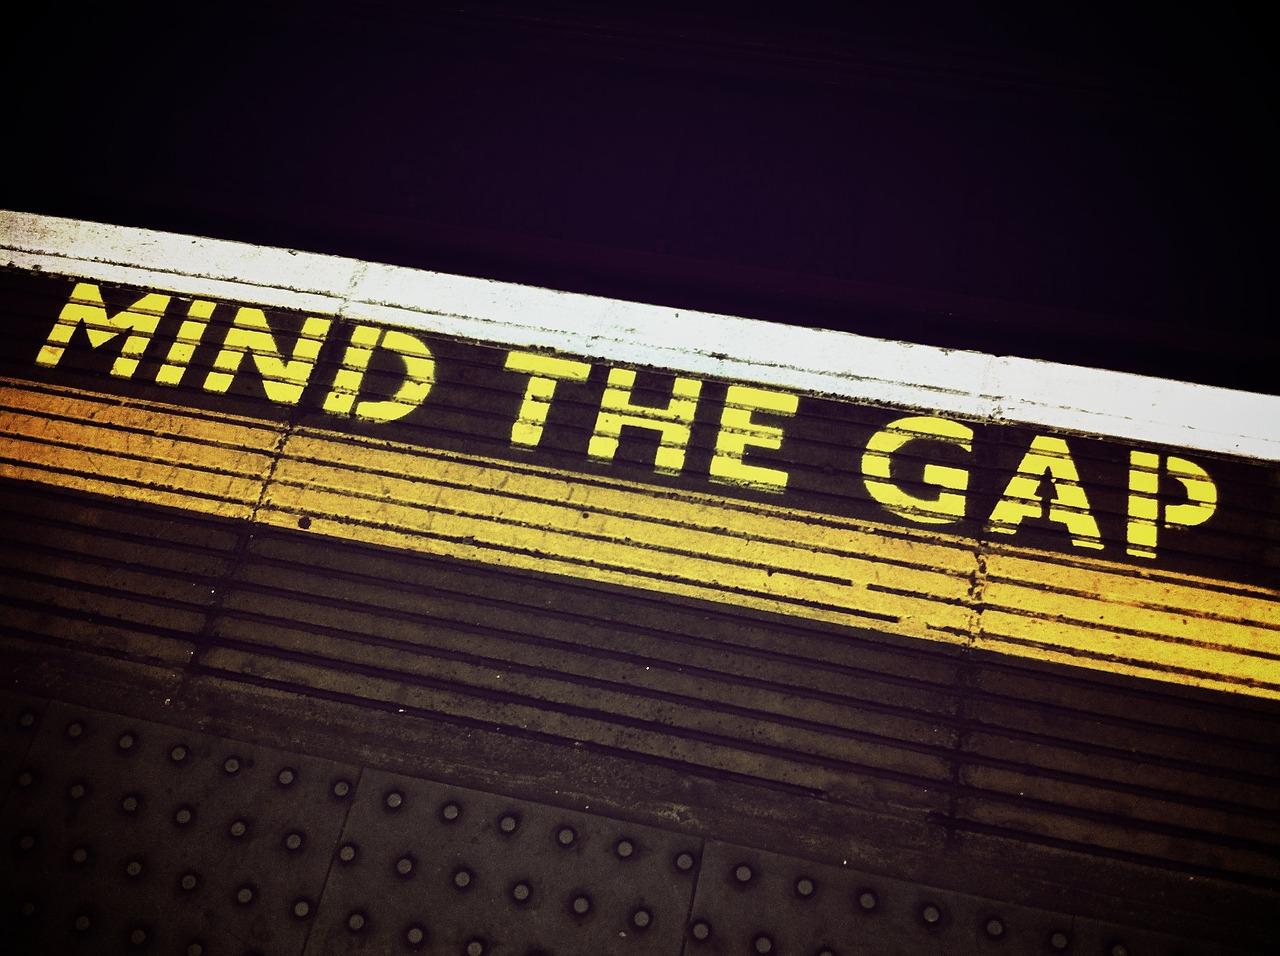 platform mind the gap